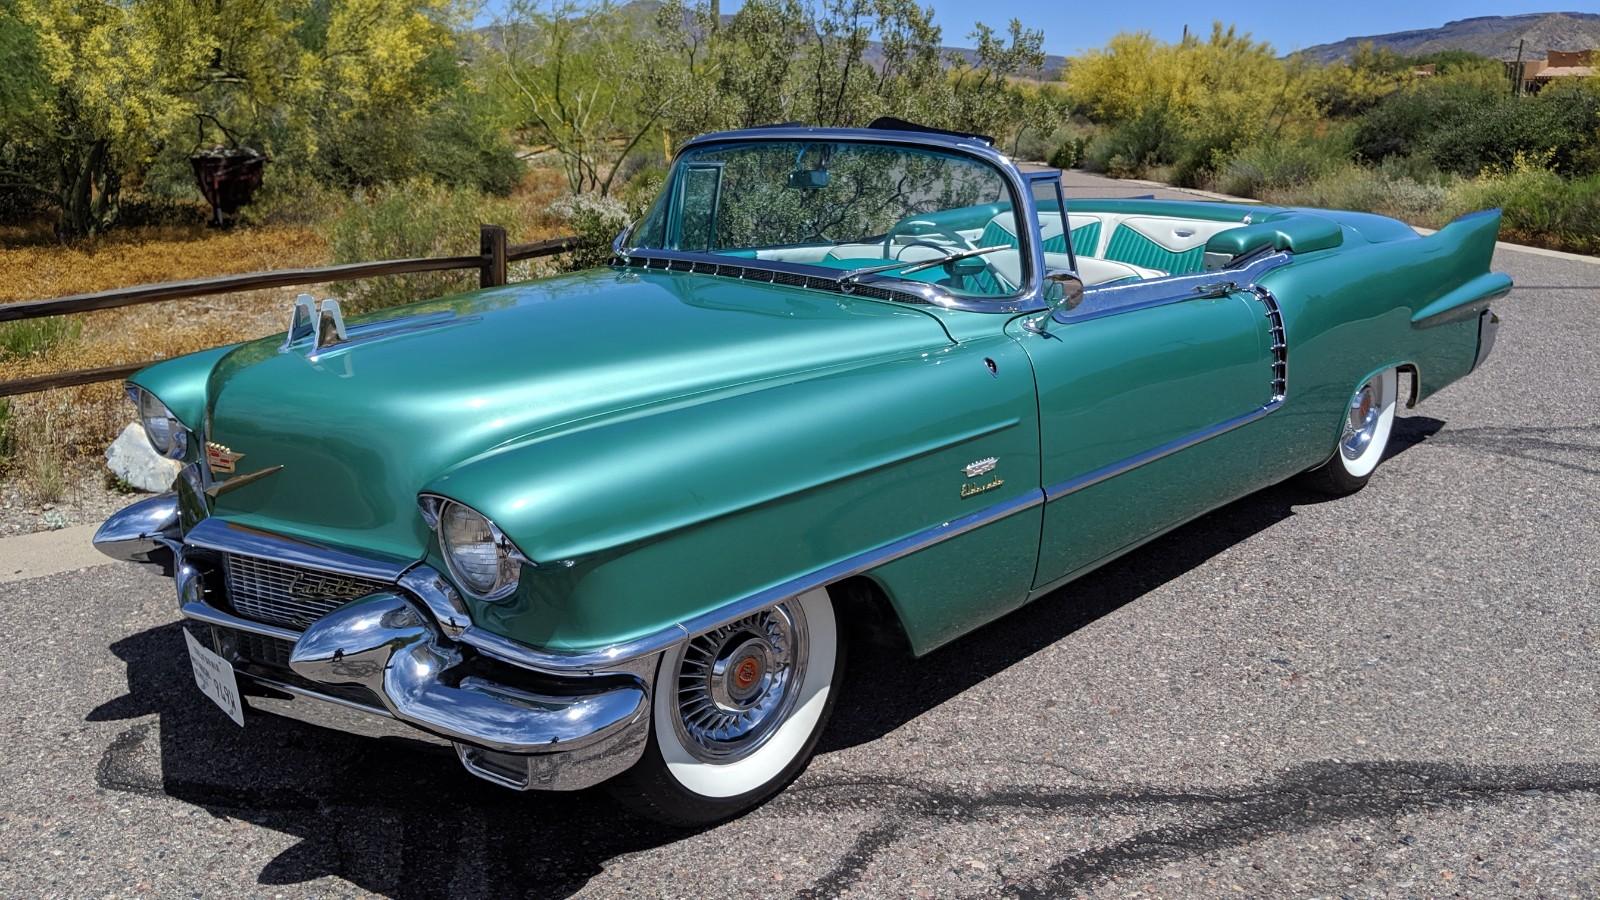 For Sale: 1956 Cadillac Eldorado Biarritz